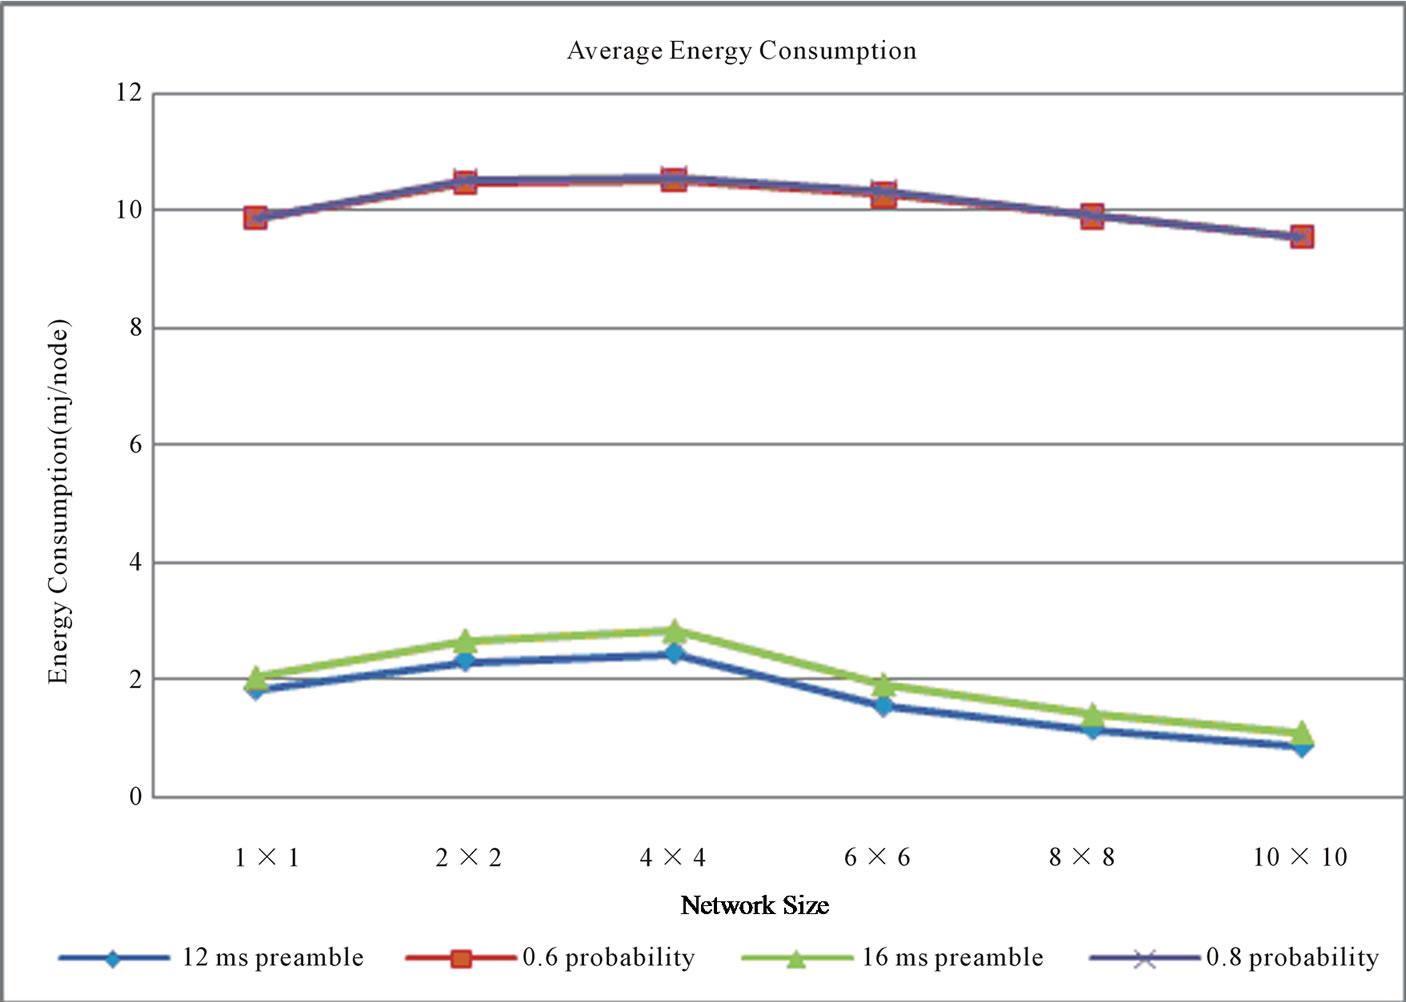 hight resolution of figure 10 energy consumption mj node vs network size